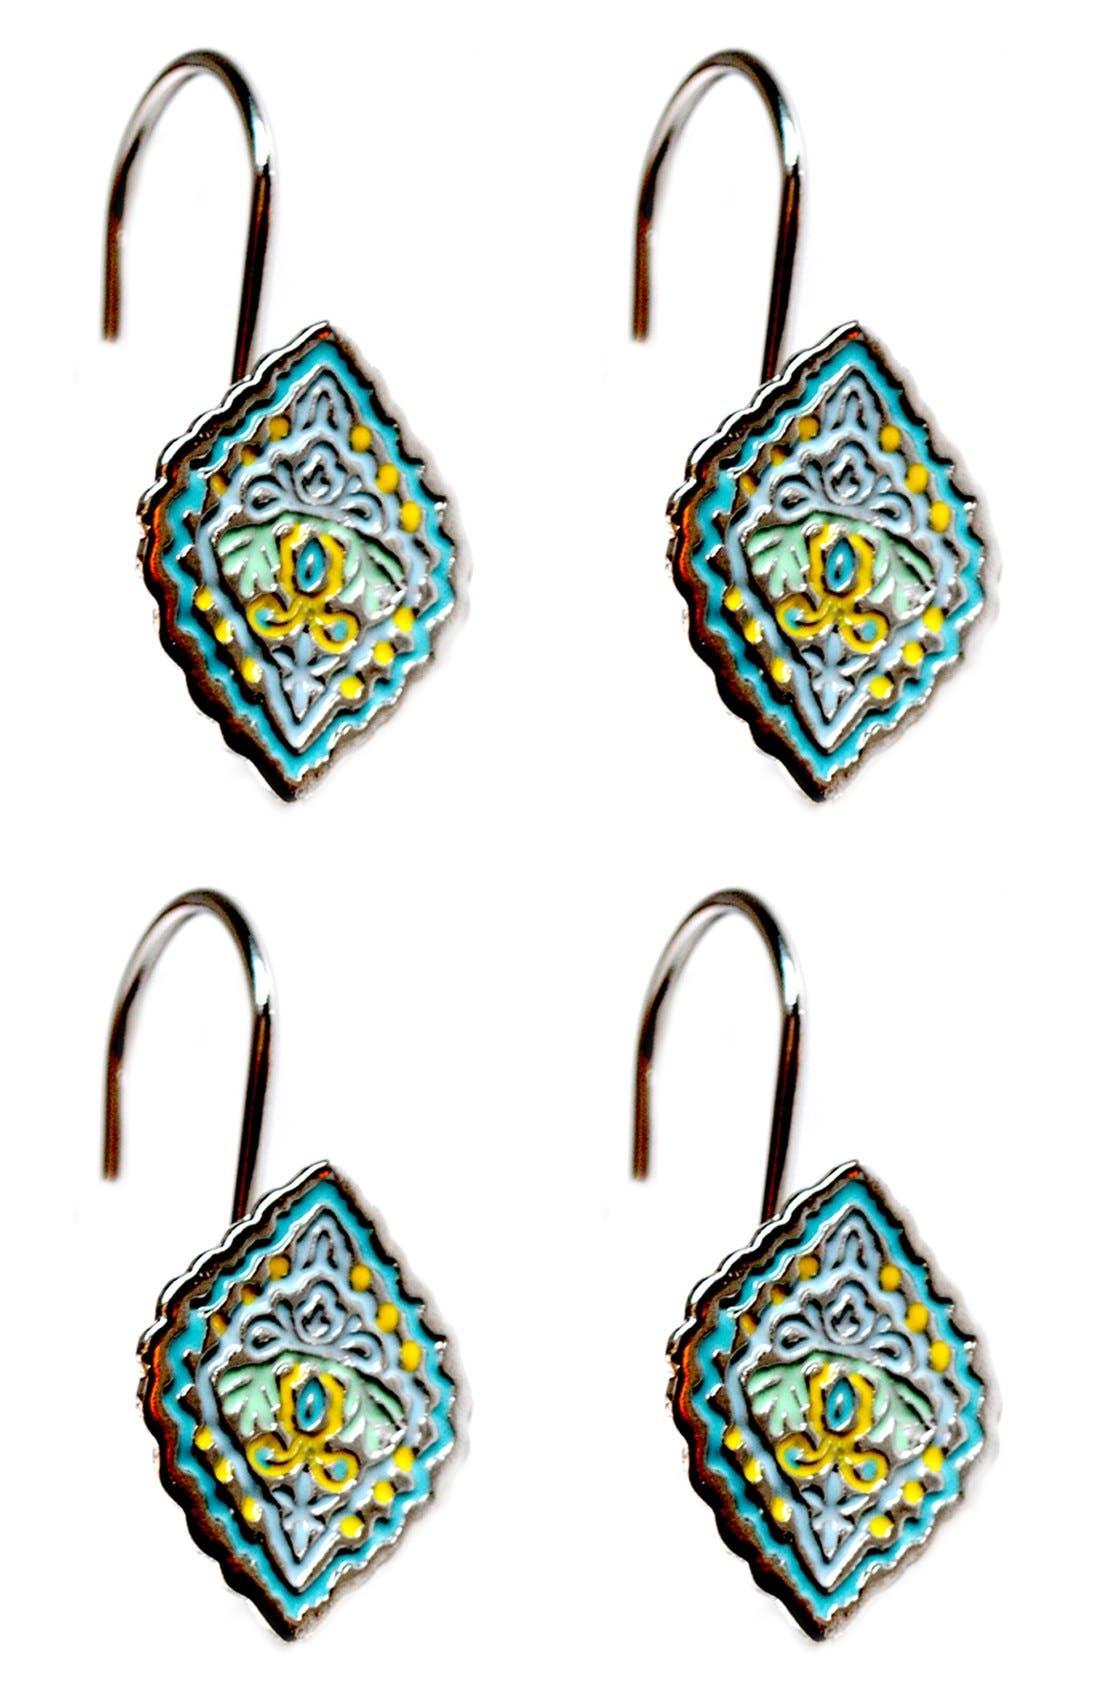 Alternate Image 1 Selected - Dena Home Diamond Shower Curtain Hooks (Set of 12)